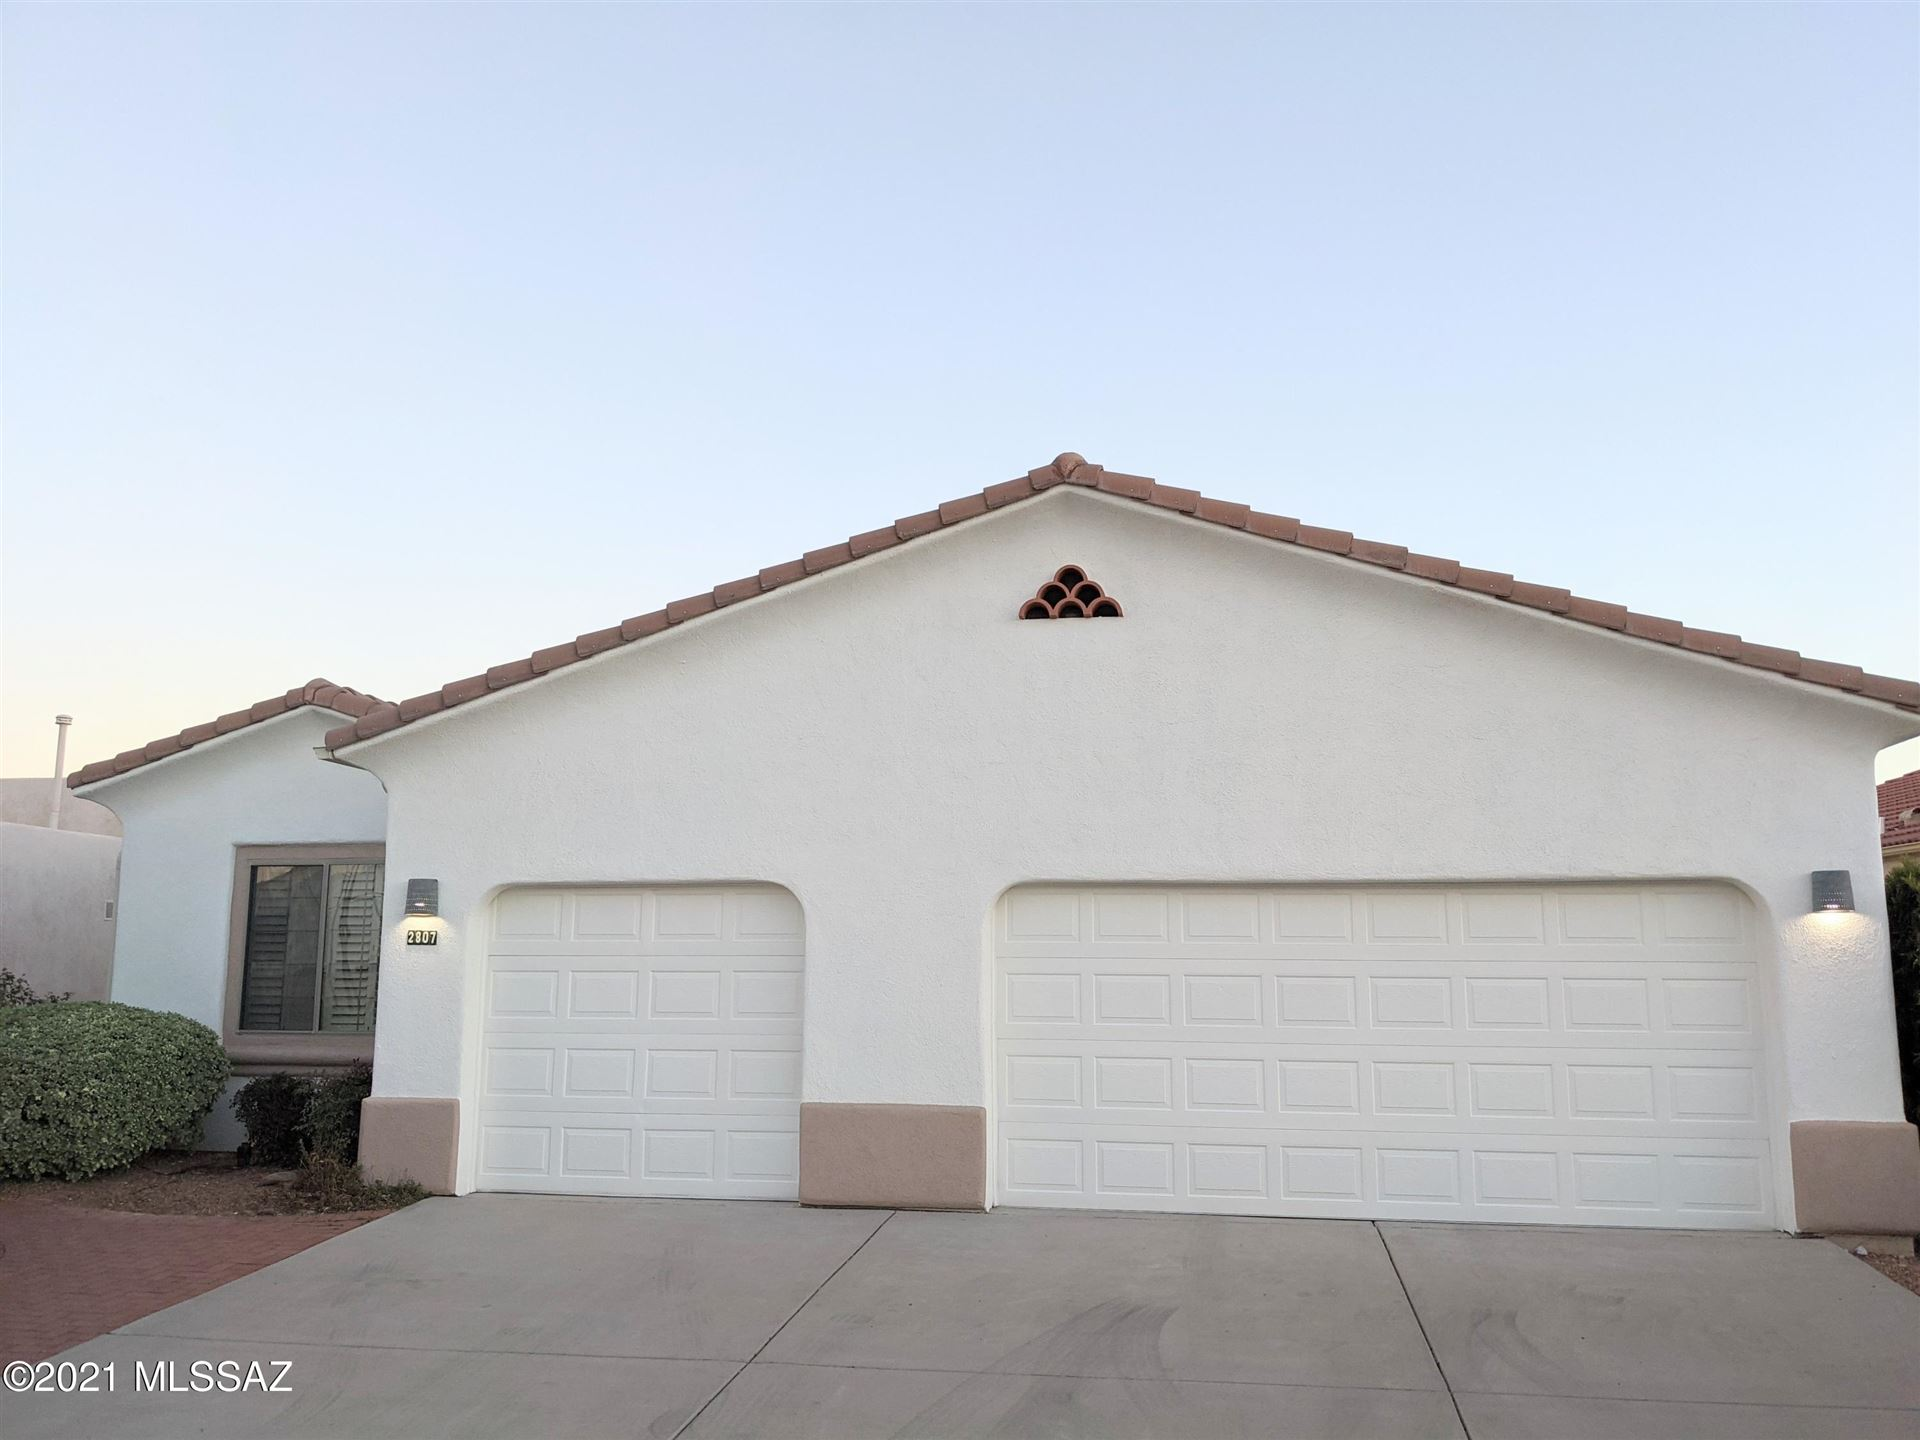 2807 S Fade Drive, Green Valley, AZ 85614 - MLS#: 22103478